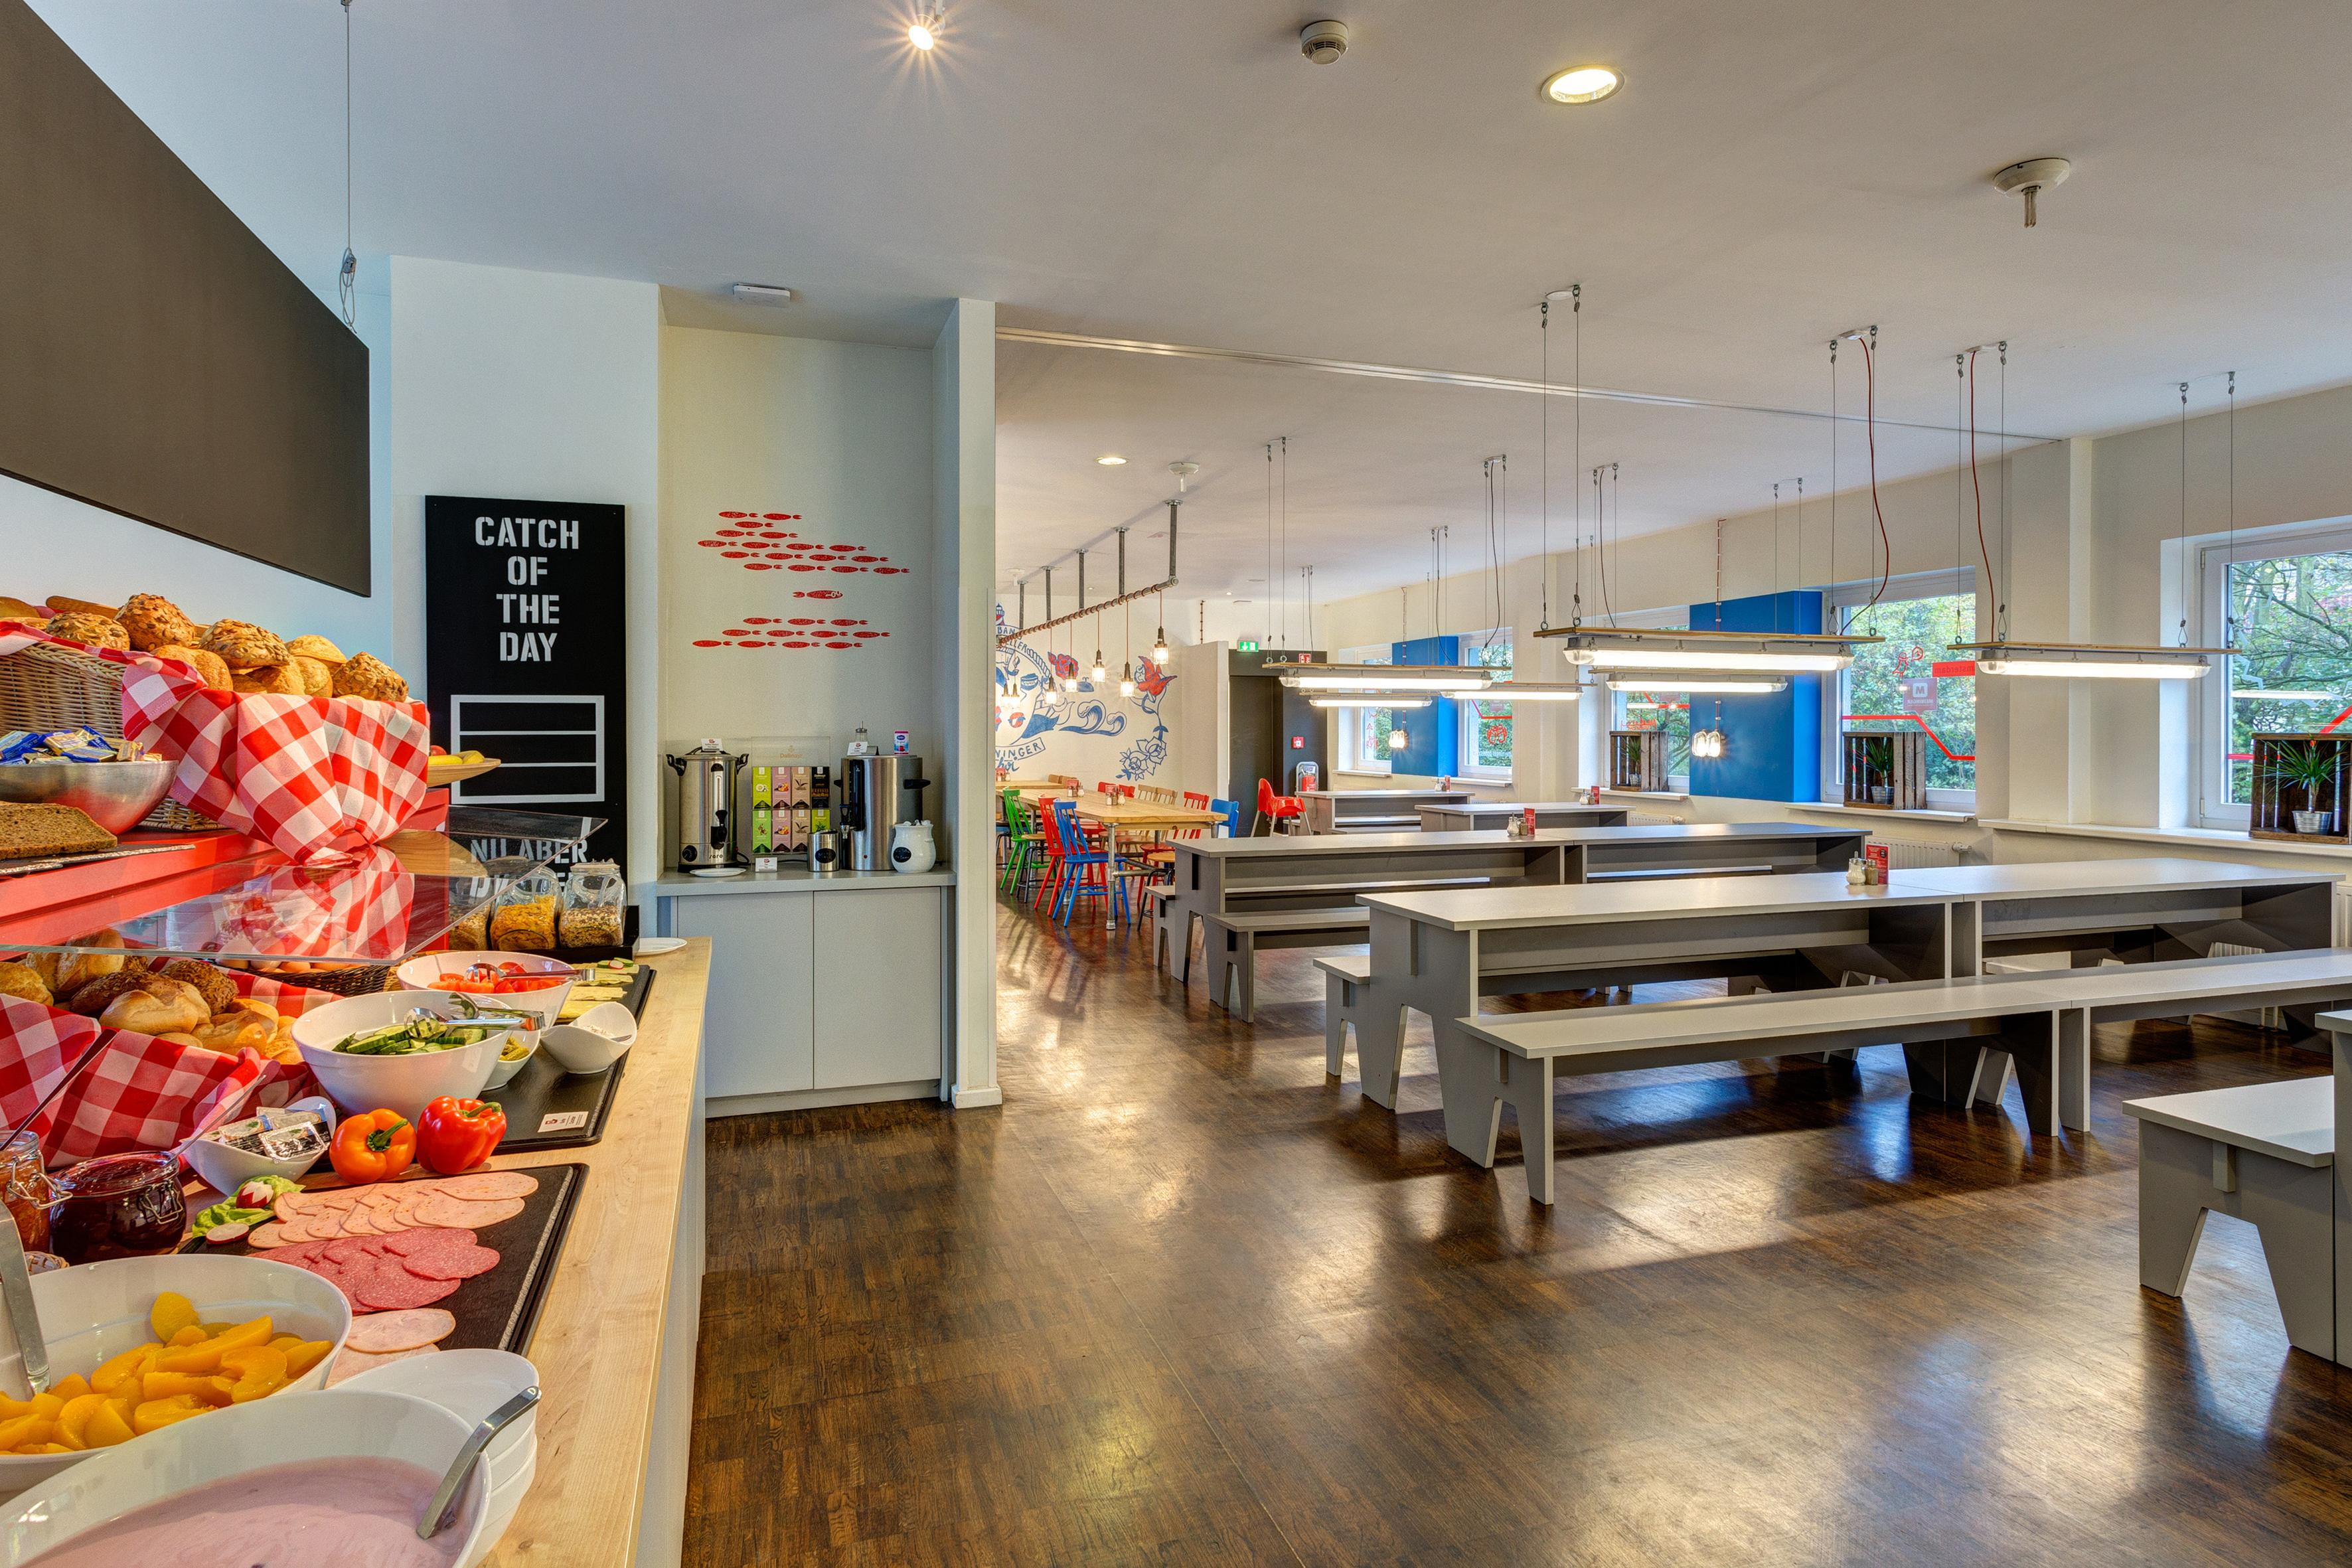 MEININGER Hotel Hamburg City Center - Sala de desayuno / Buffet